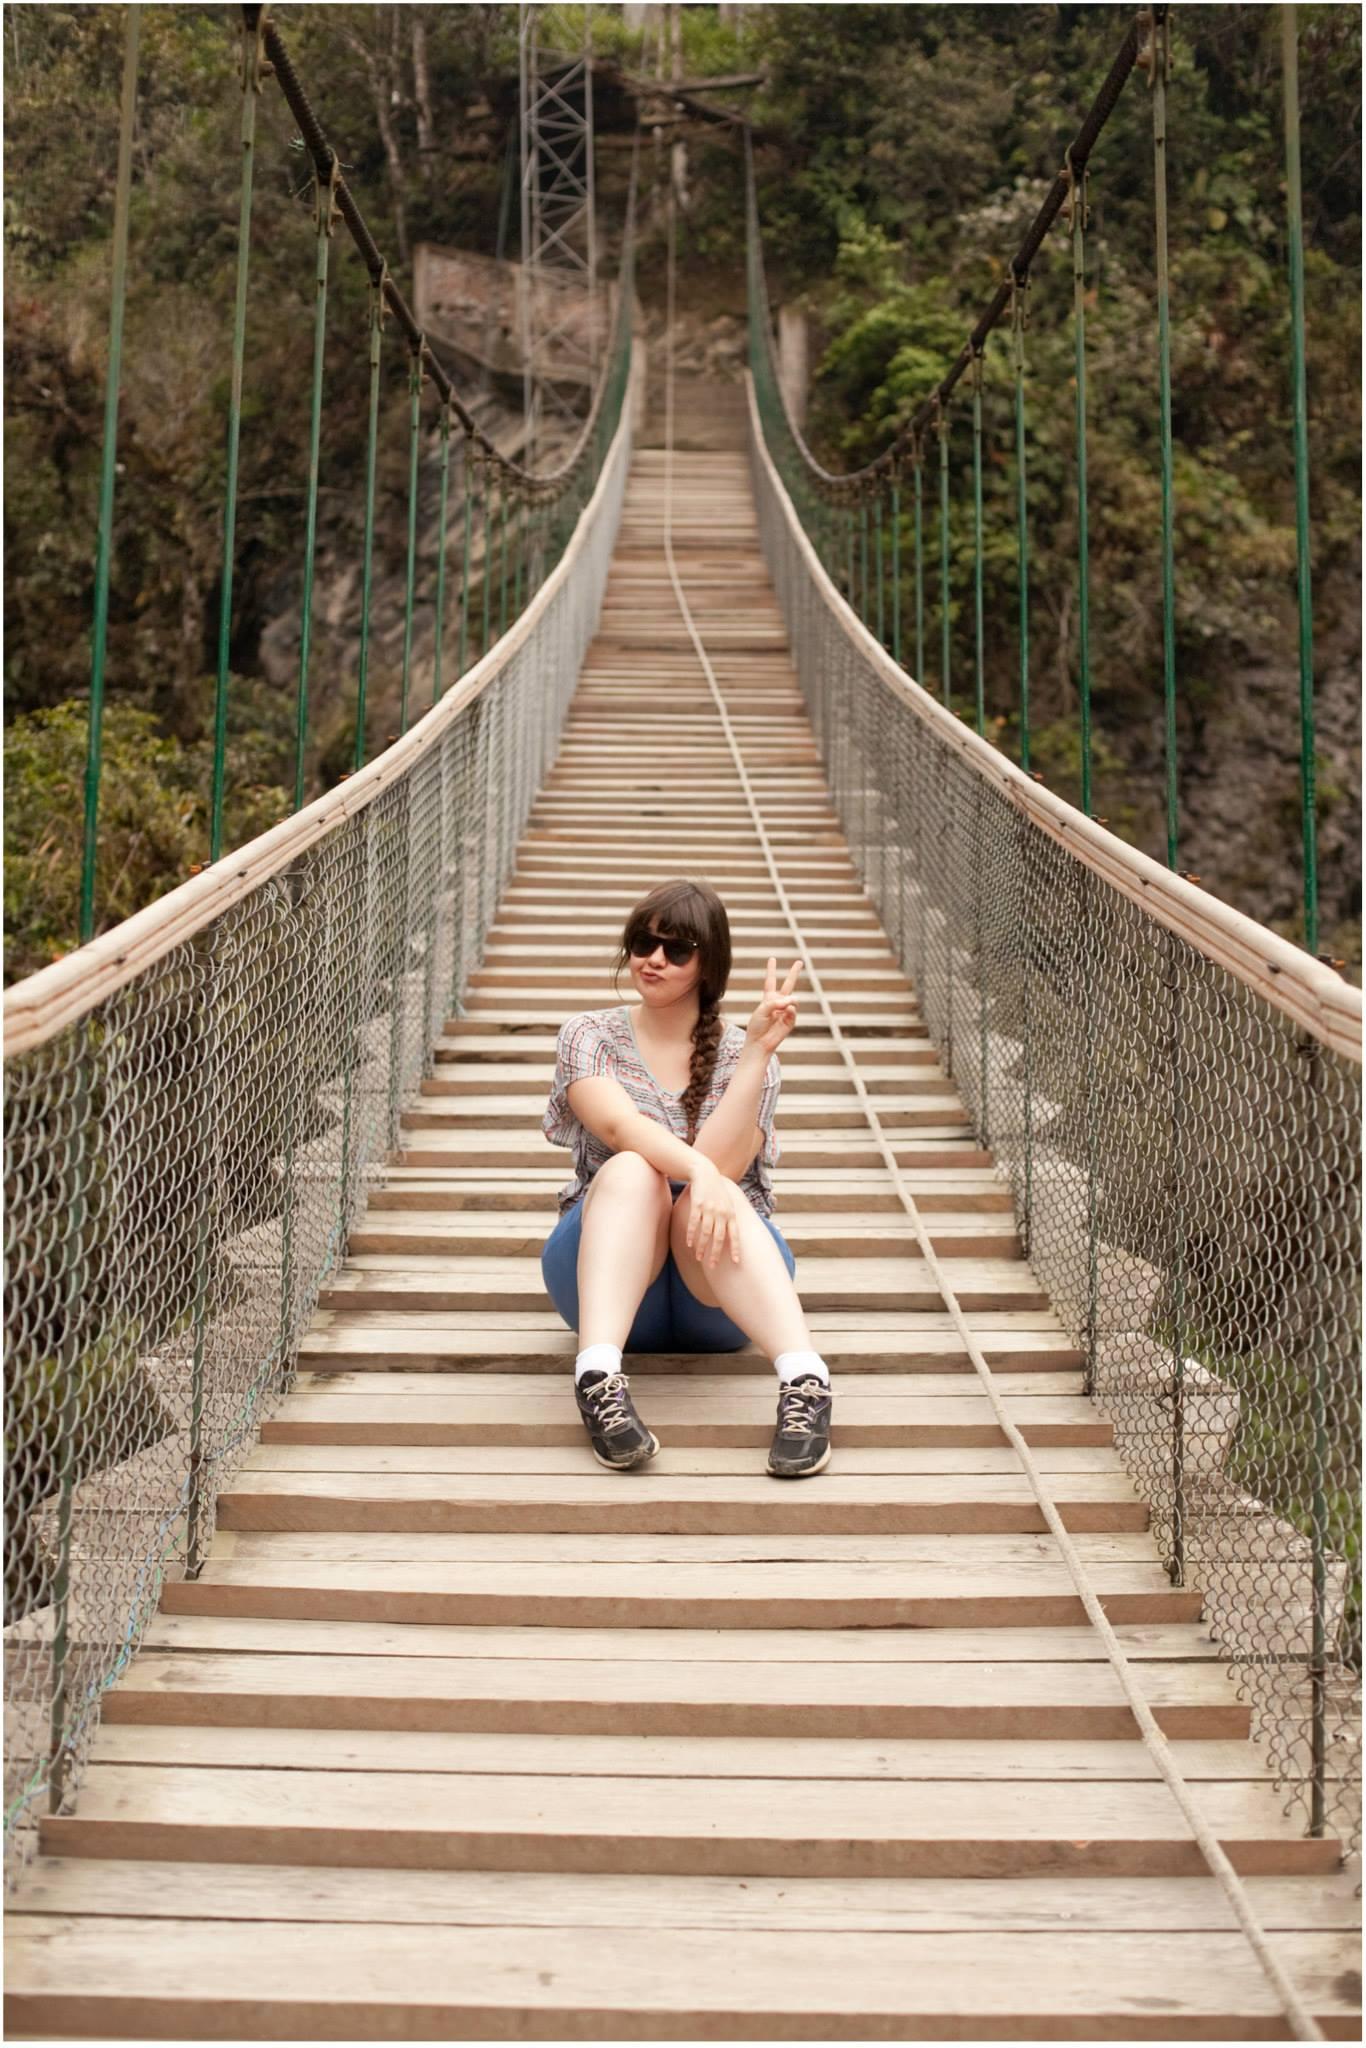 banos-ecuador-bridge-hiking-01.jpg